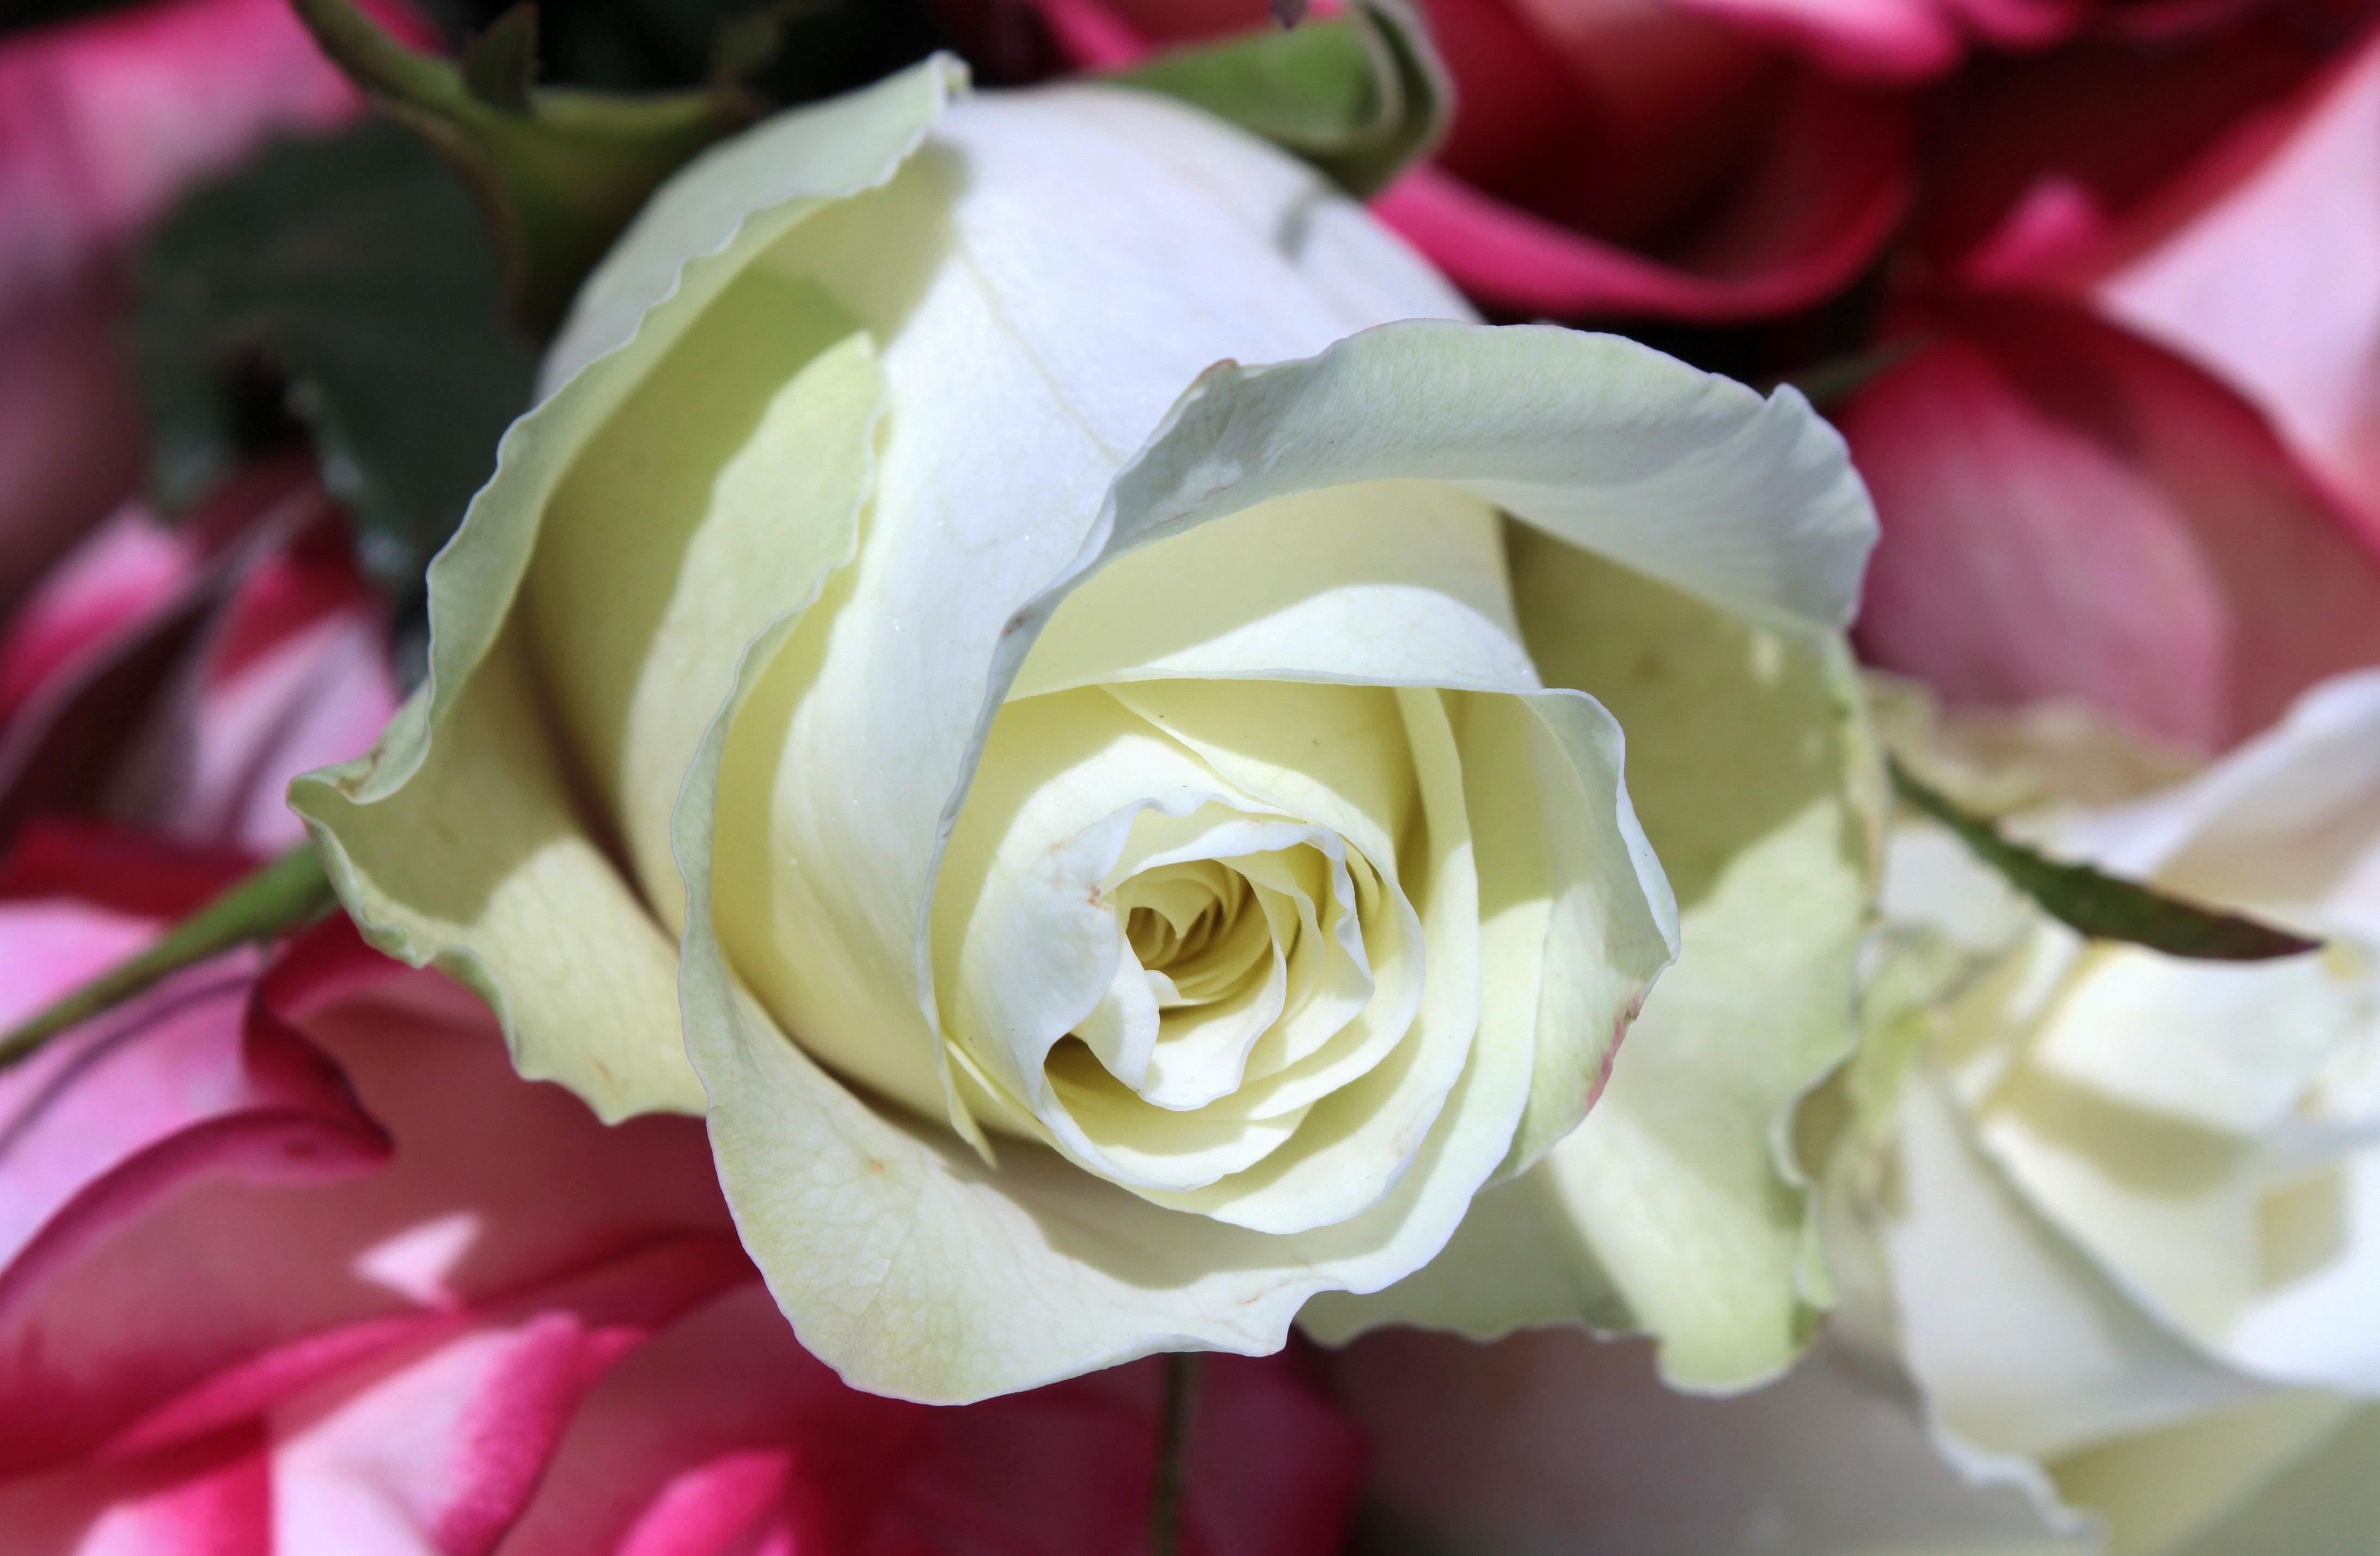 Free Images Blossom Petal Bloom Romantic Pink Flora Close Up